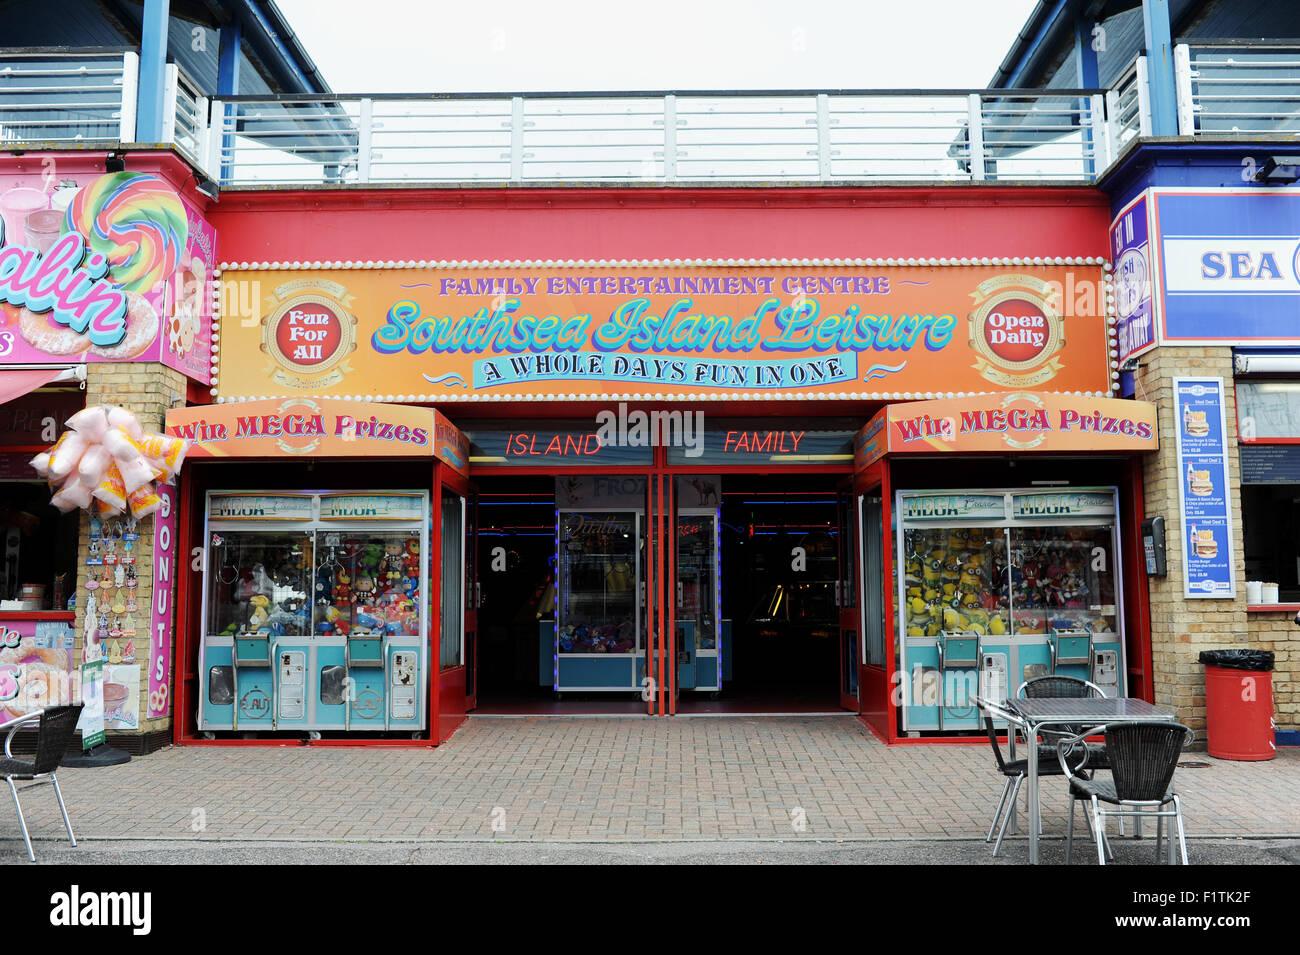 Southsea Portsmouth Hampshire UK - Southsea Island Leisure amusement arcade on the seafront Stock Photo